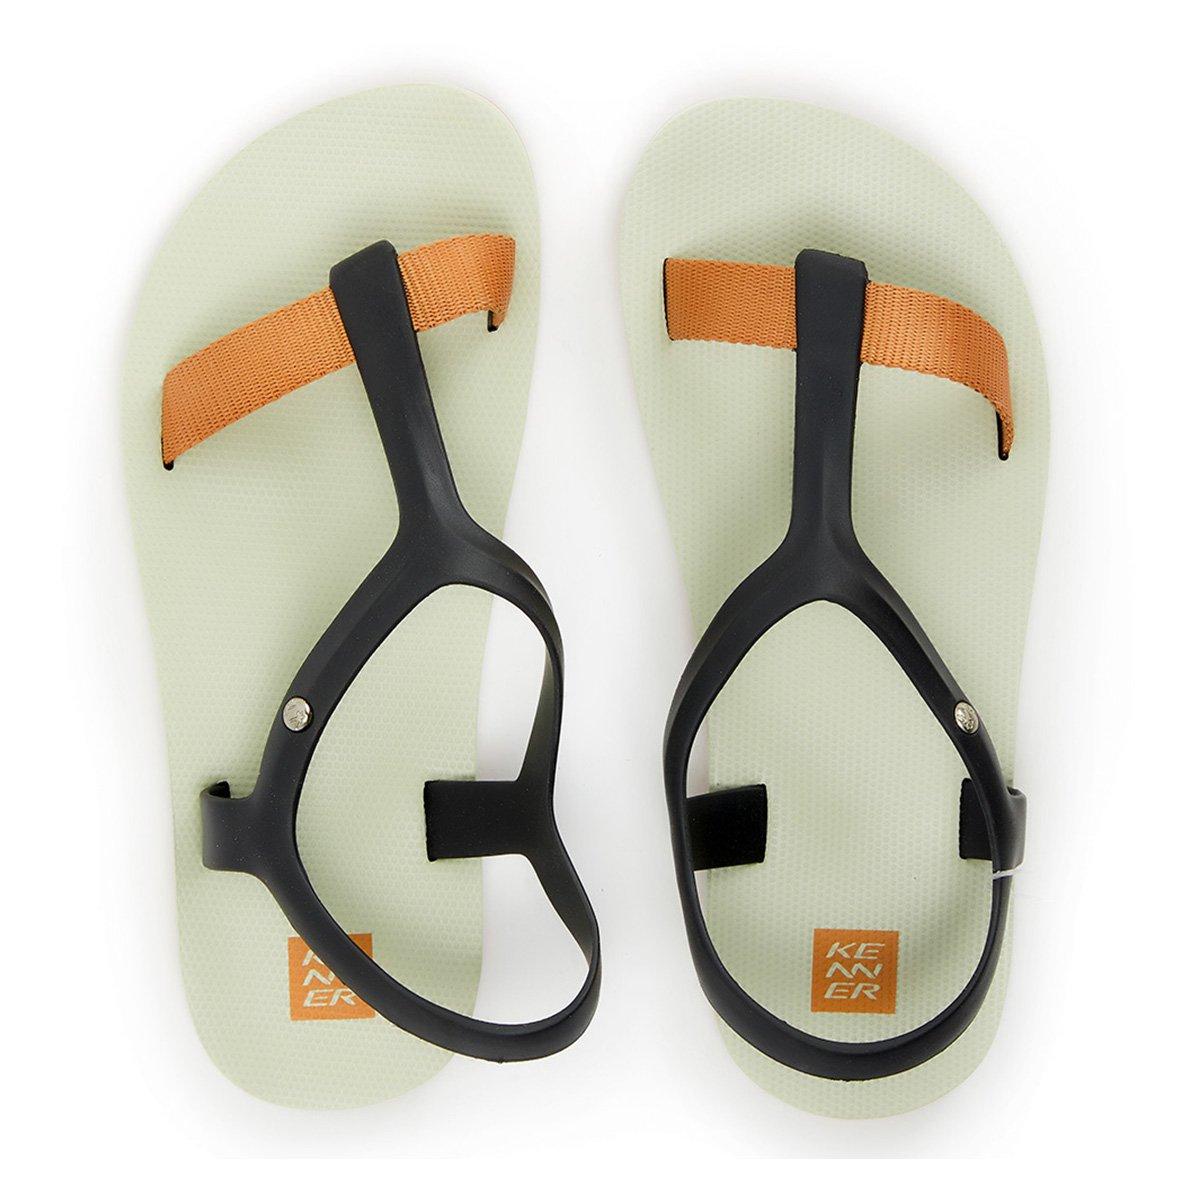 Chinelo Kenner Sandal Classic Feminino